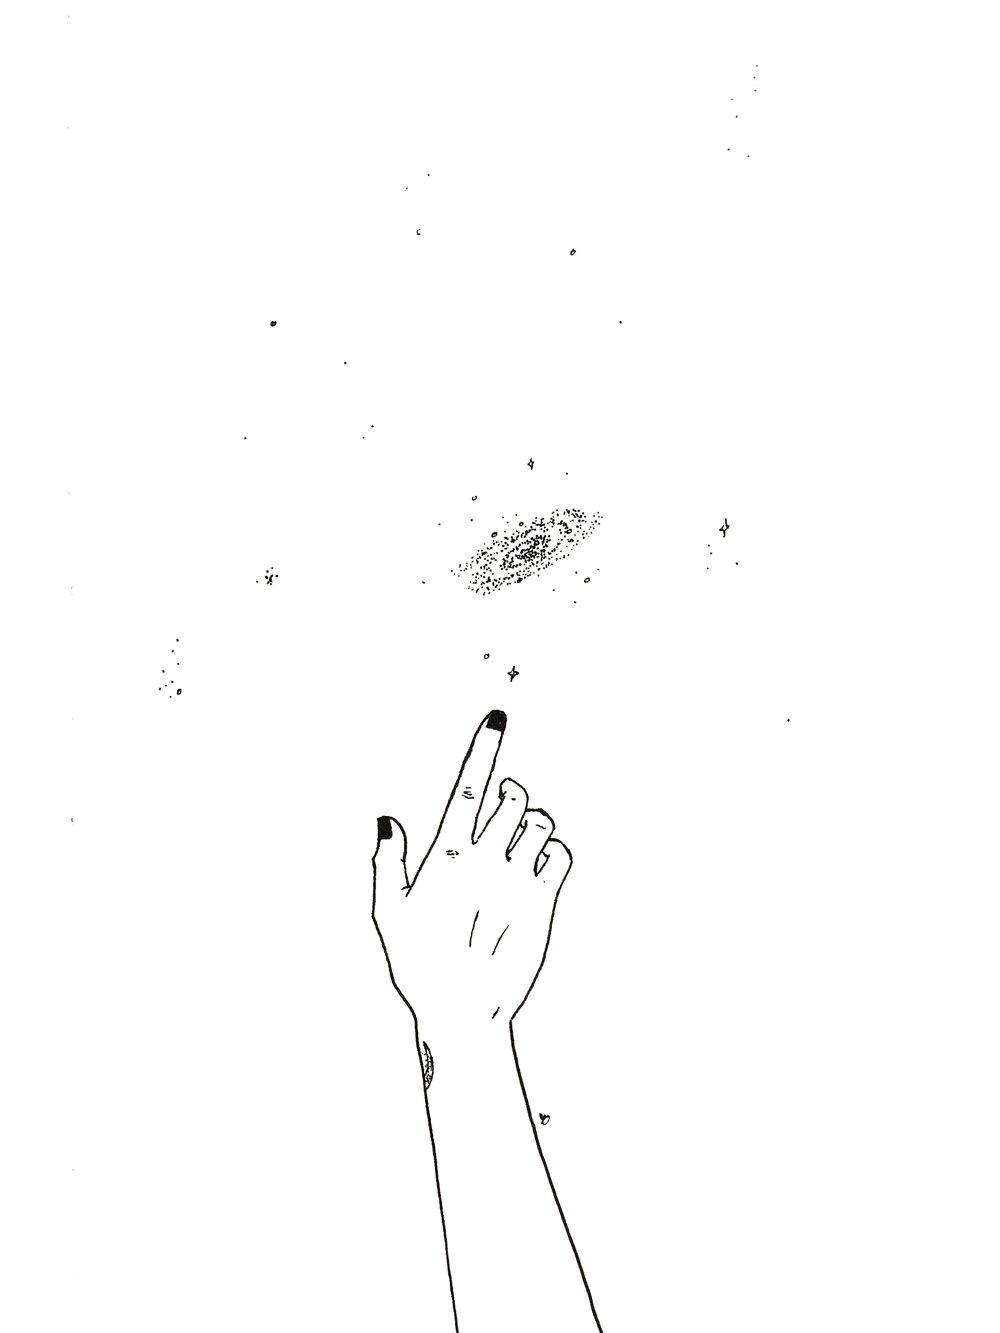 All the Stars are Closer